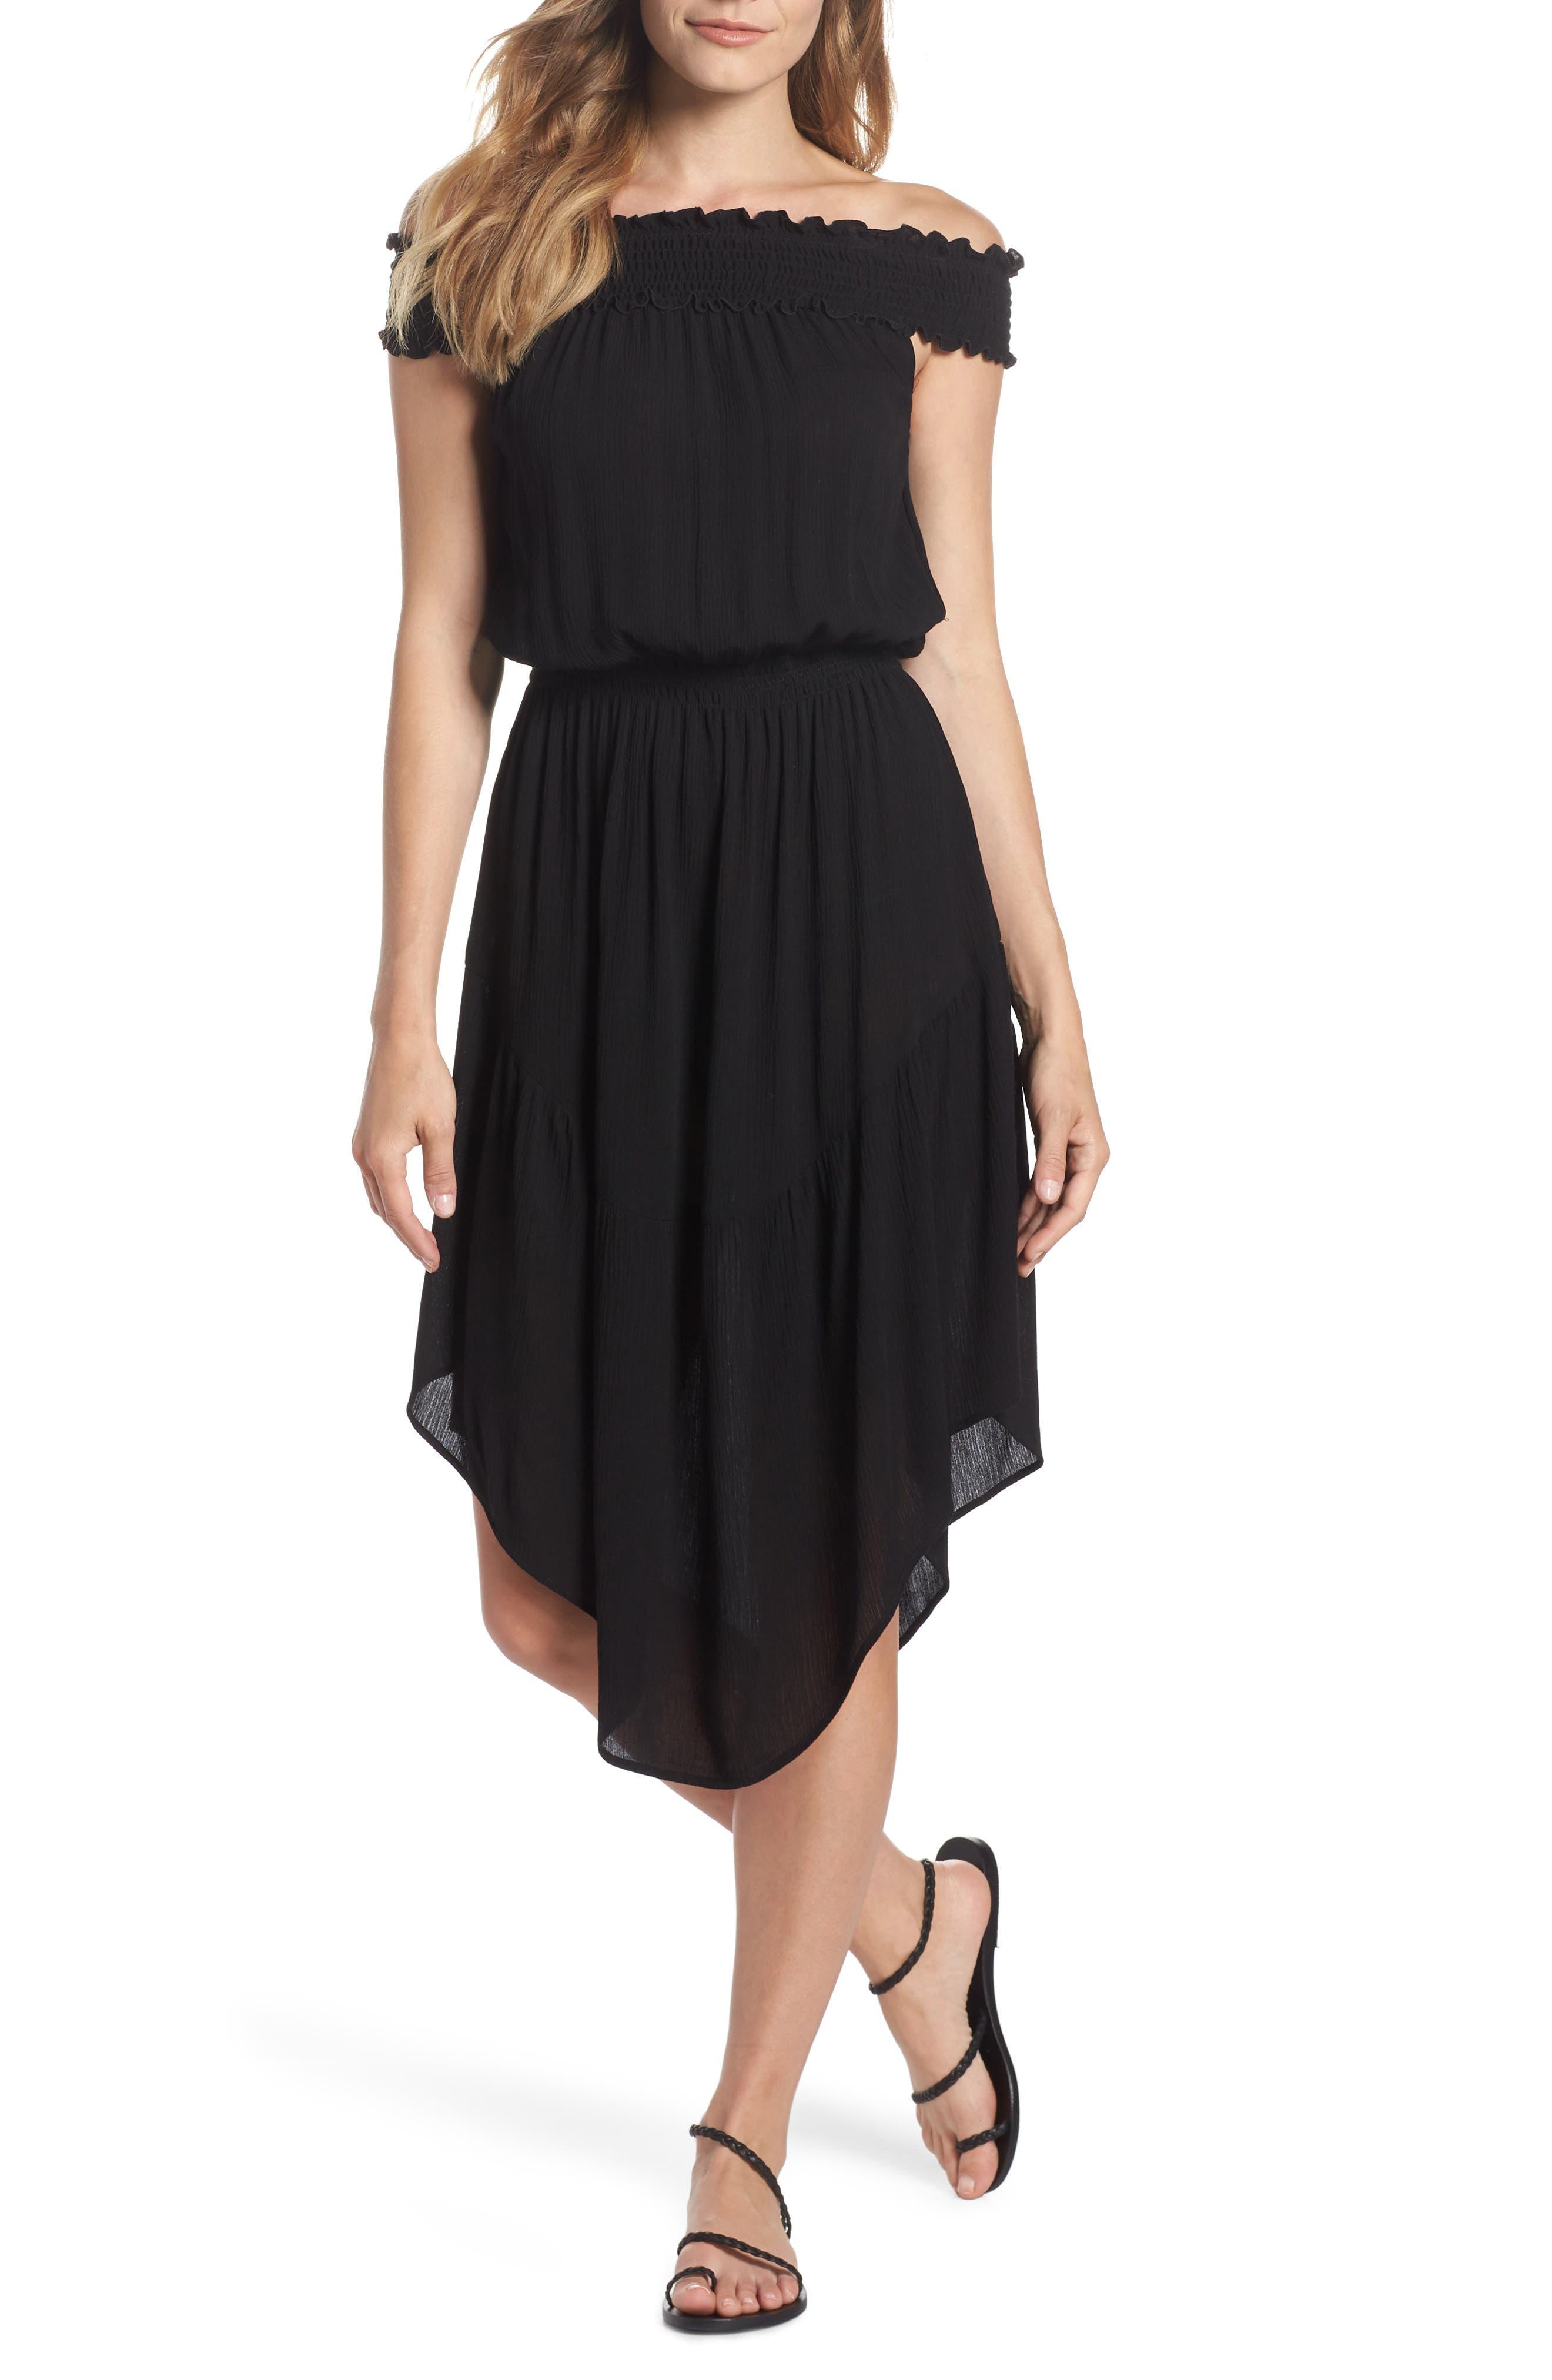 Summer Breeze Off the Shoulder Cover-Up Dress,                             Main thumbnail 1, color,                             BLACK